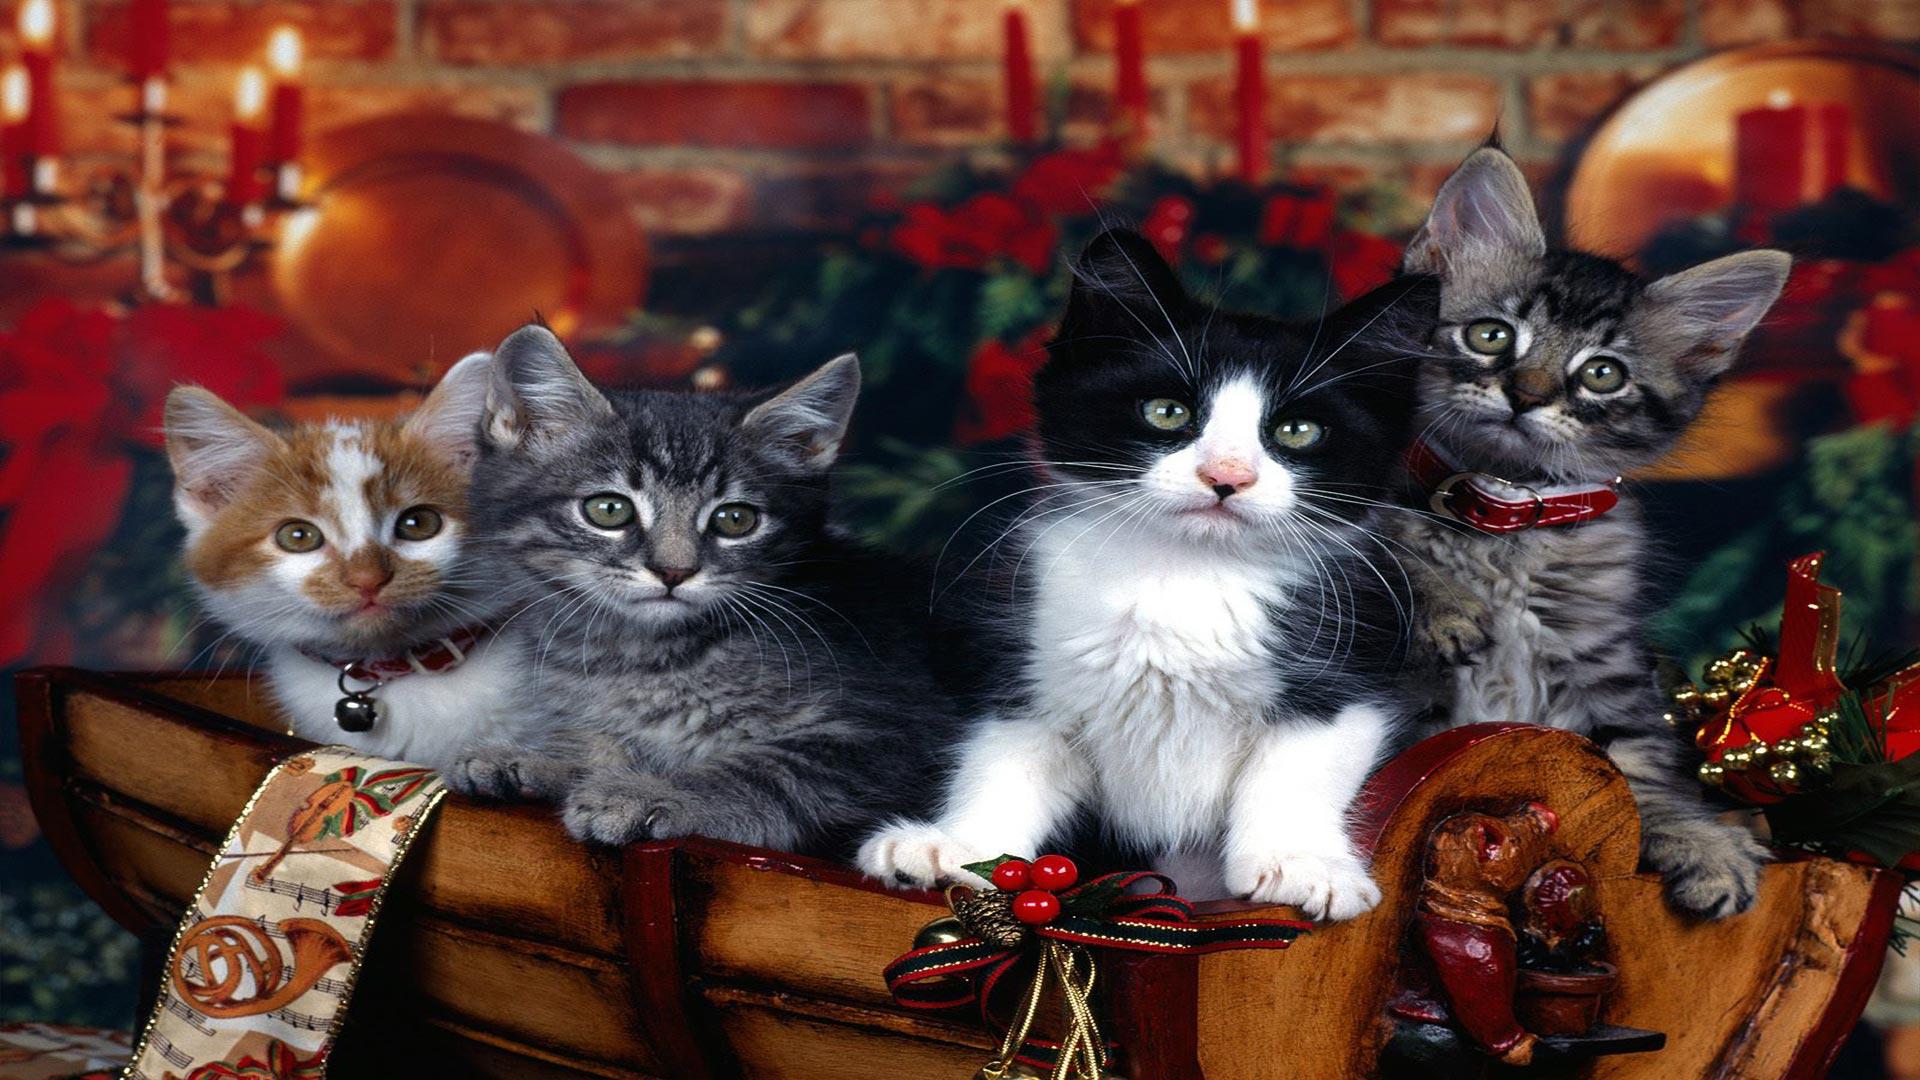 Обои на рабочий стол 1366х768 кошка